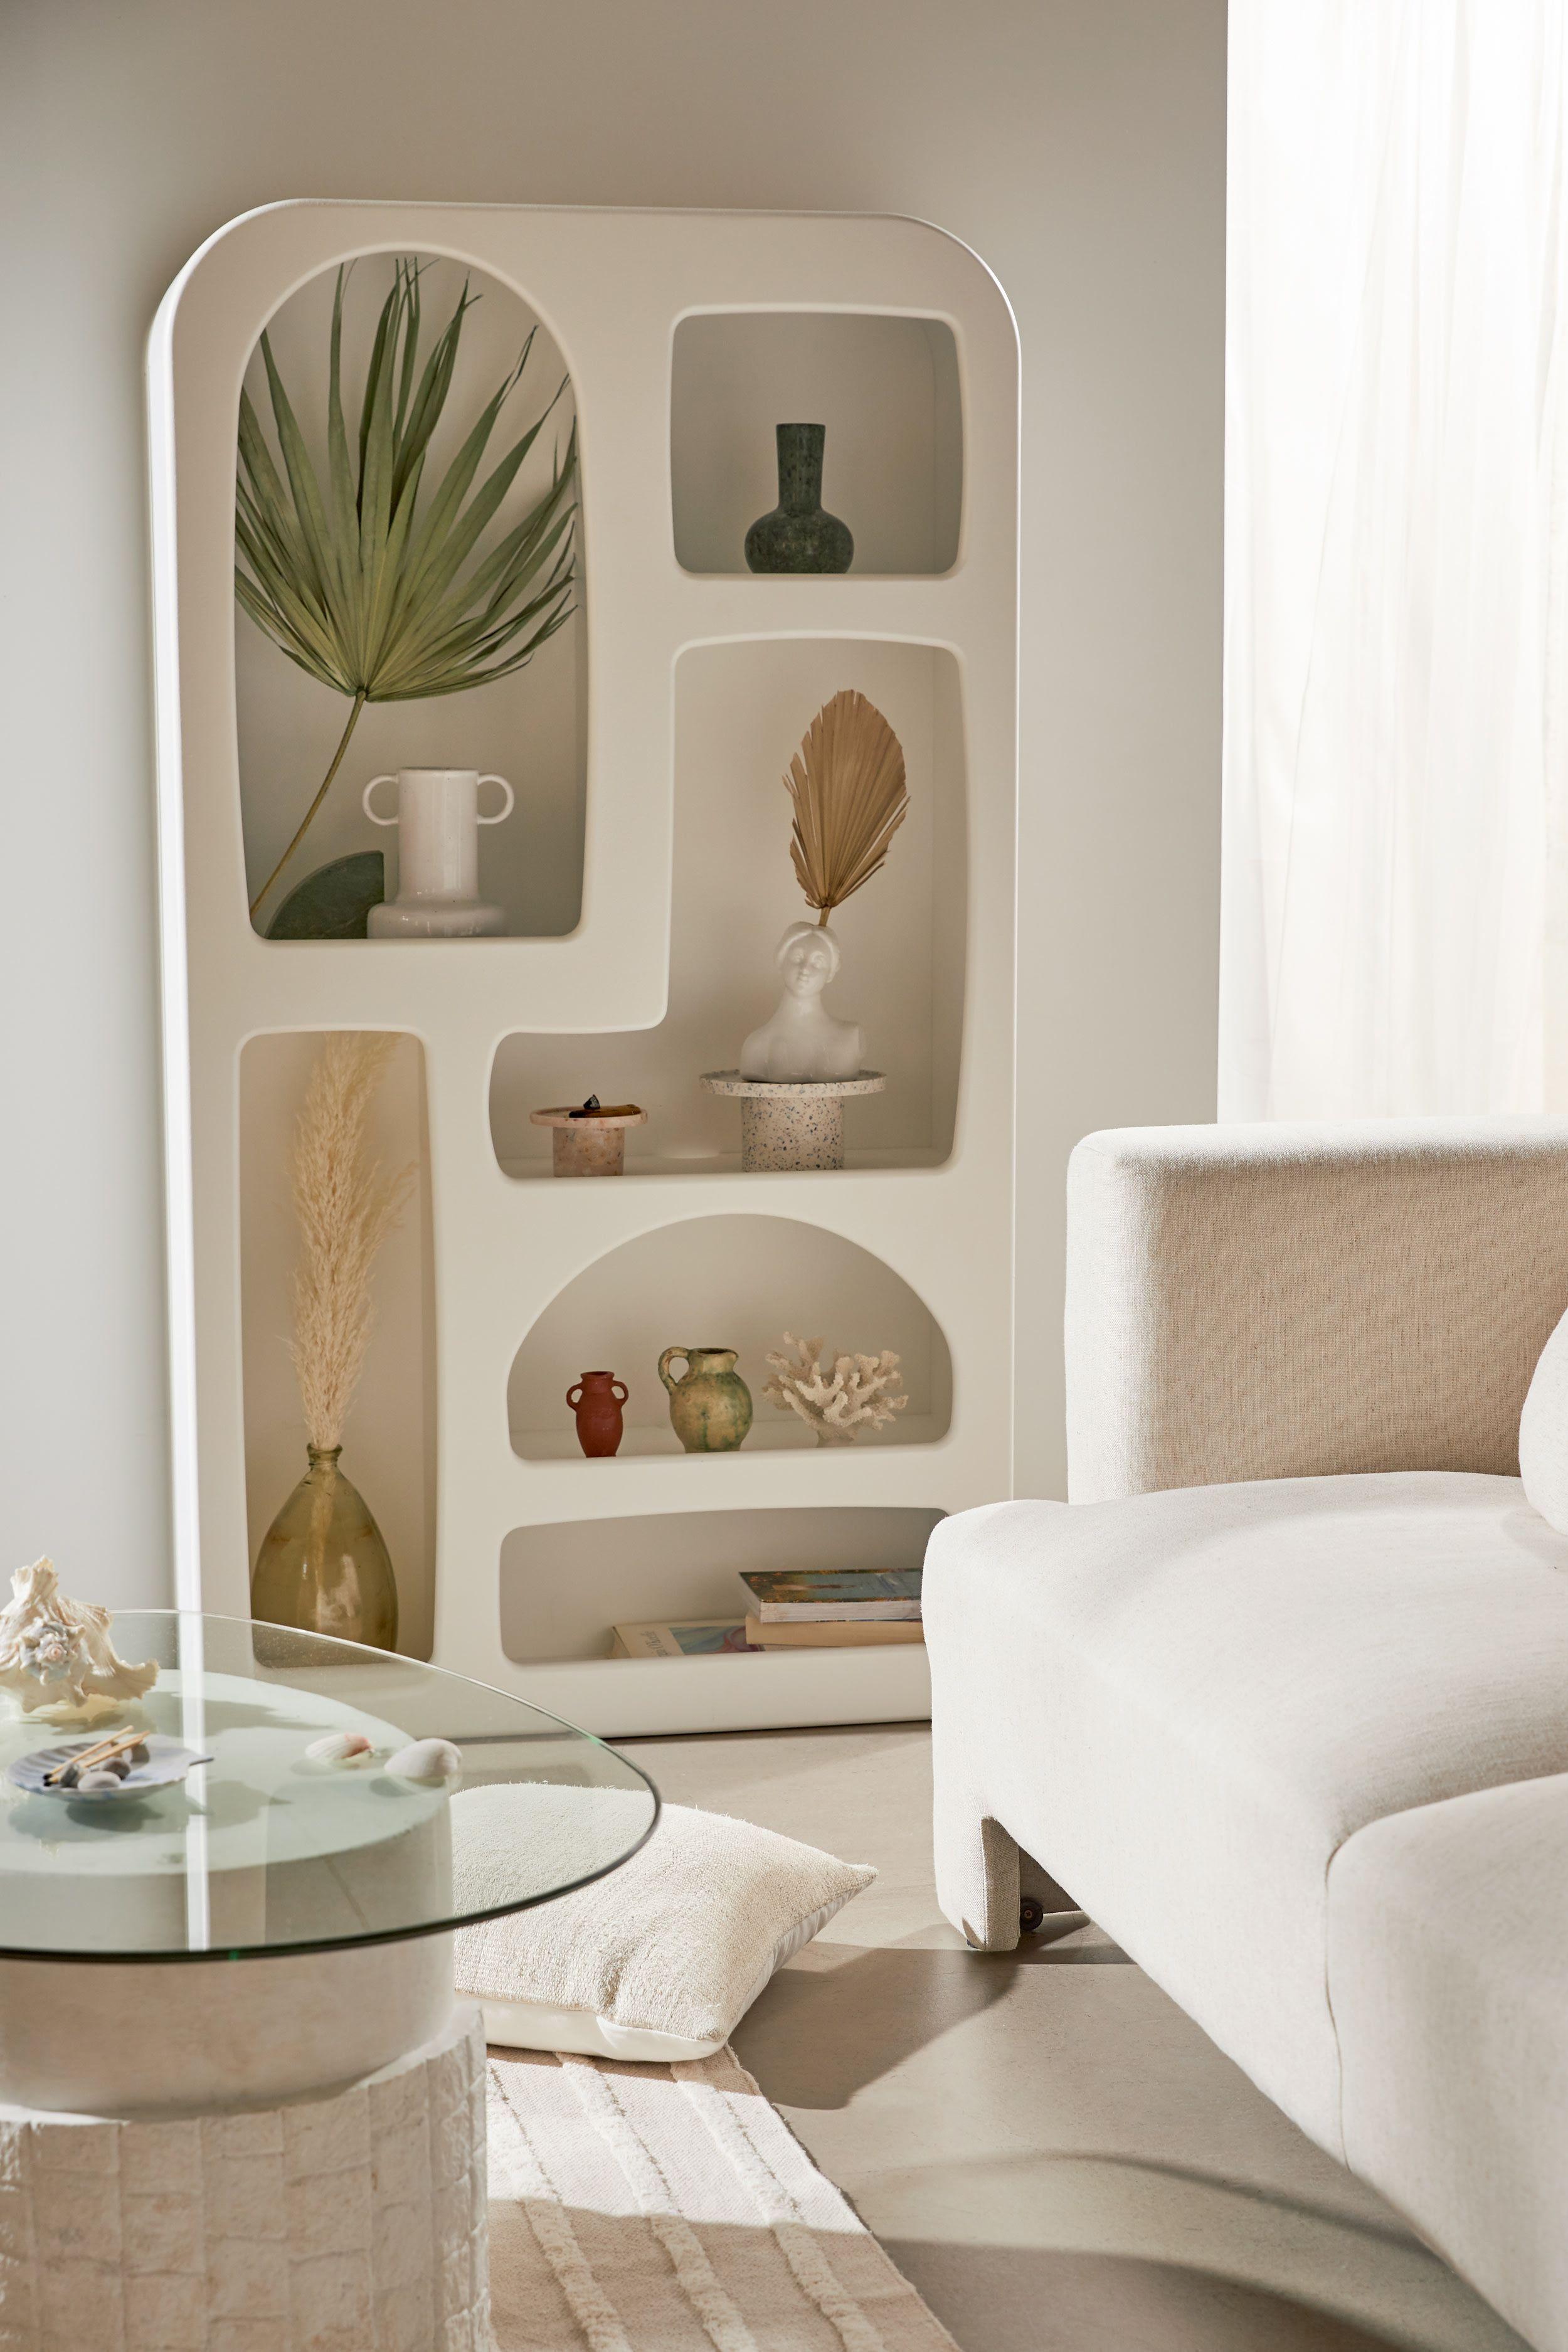 Creative Home Decoration Interior Design Design Visual Creative Home Decoration Interior Design Design Visual House Interior Interior Furniture